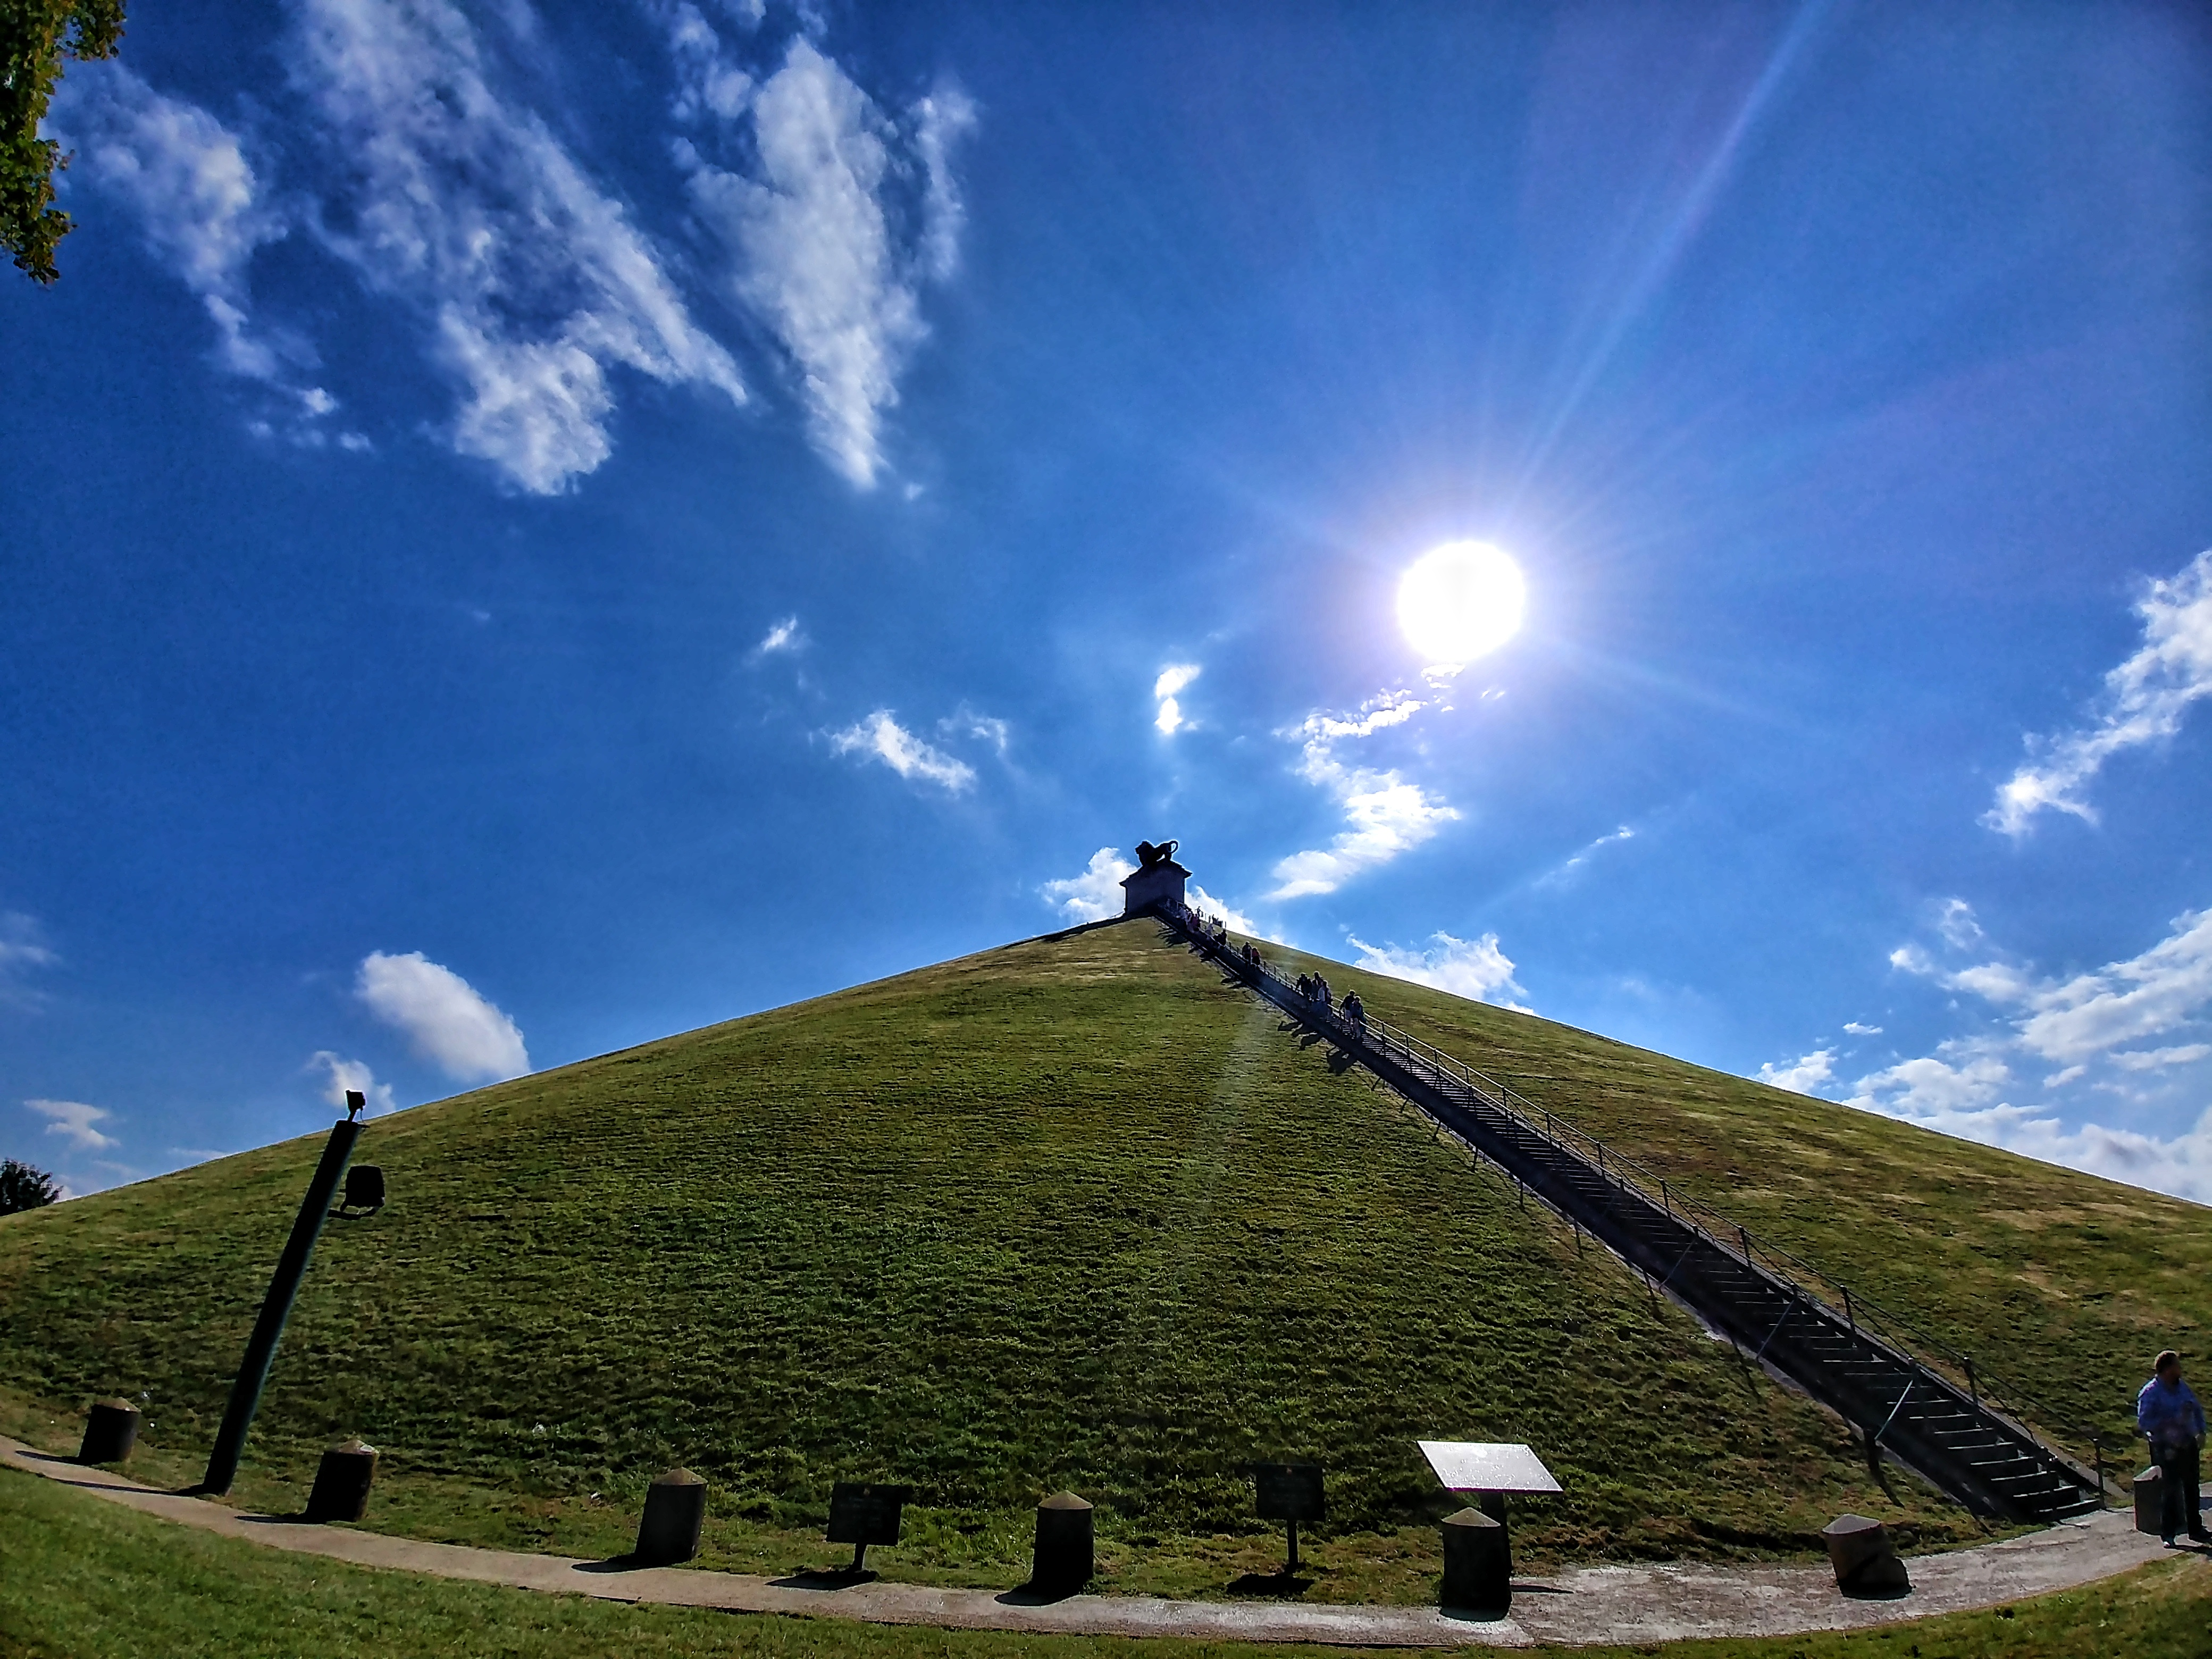 Waterloo - Butte du Lion - Lion Mound